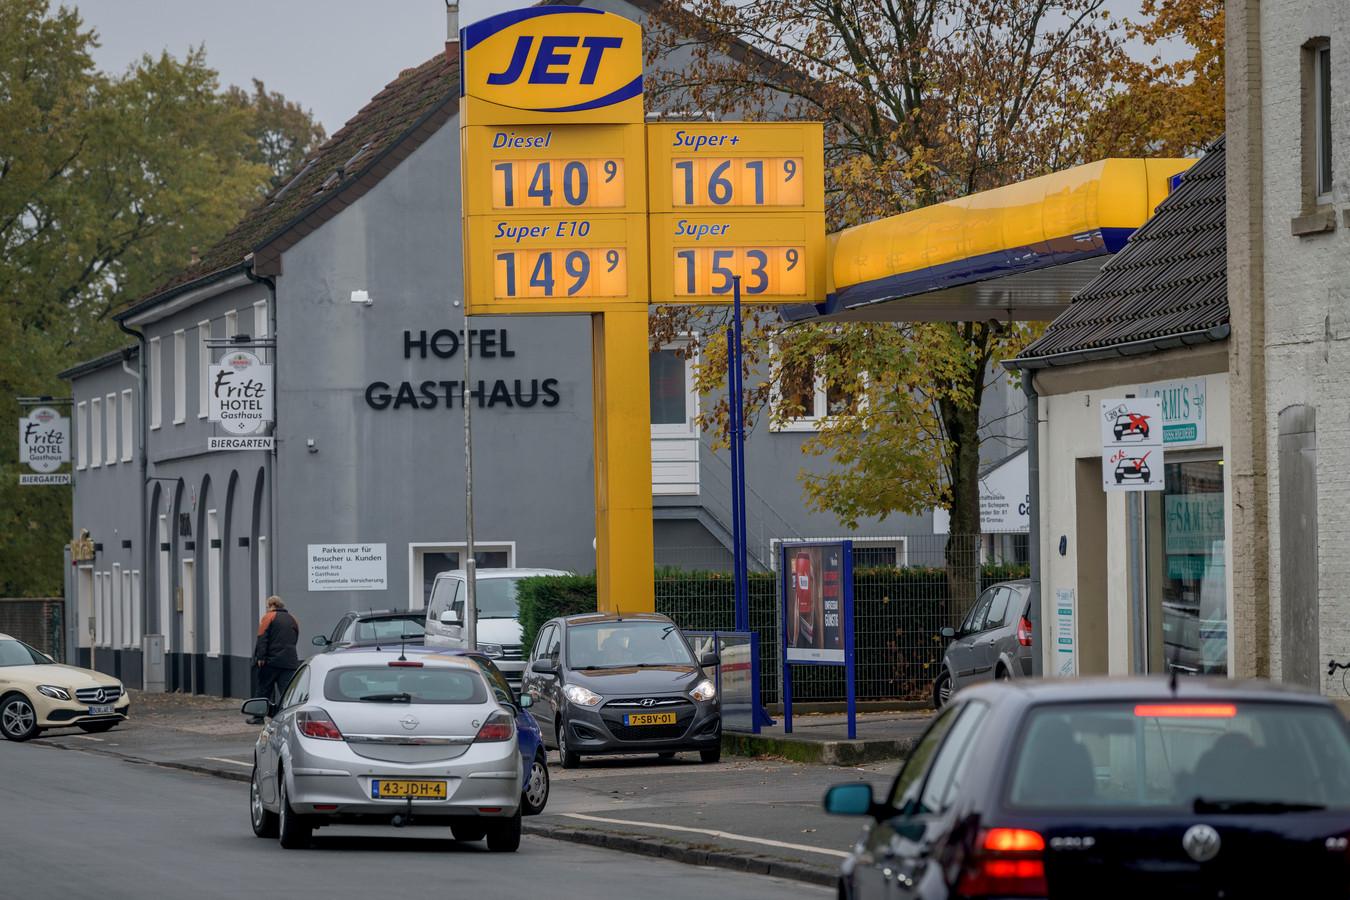 Het tankstation in Duitsland